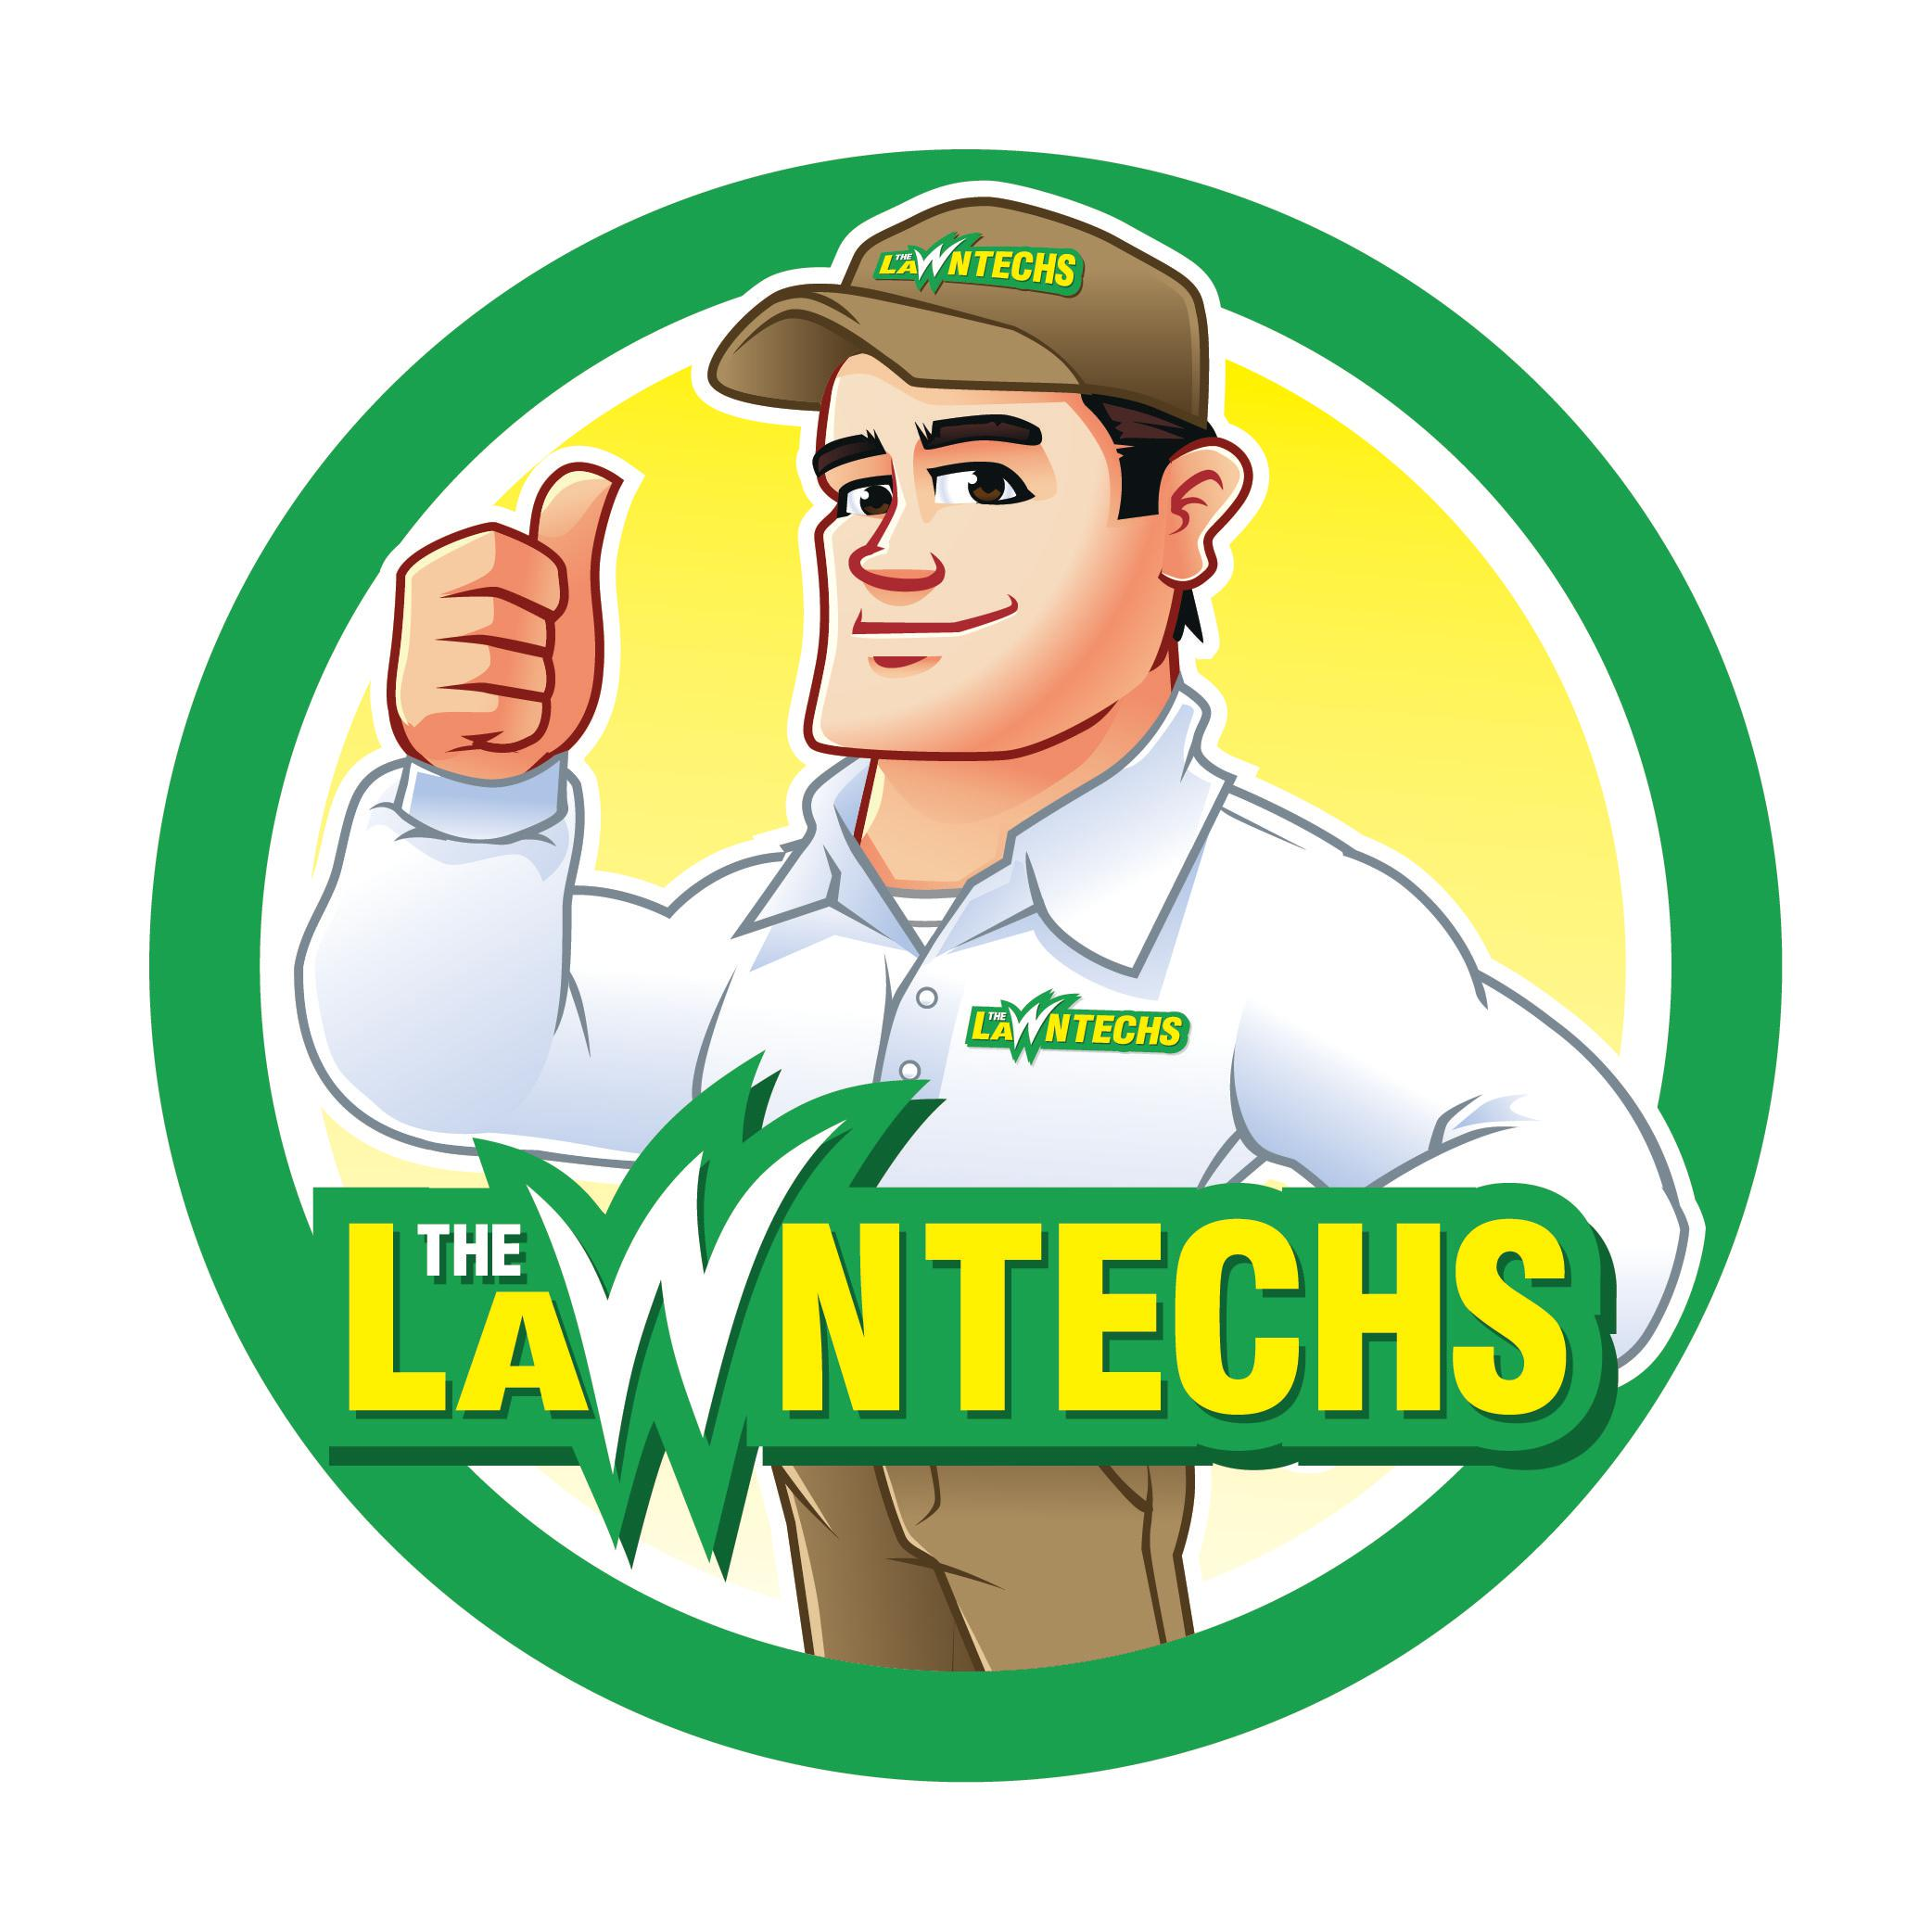 The Lawn Techs